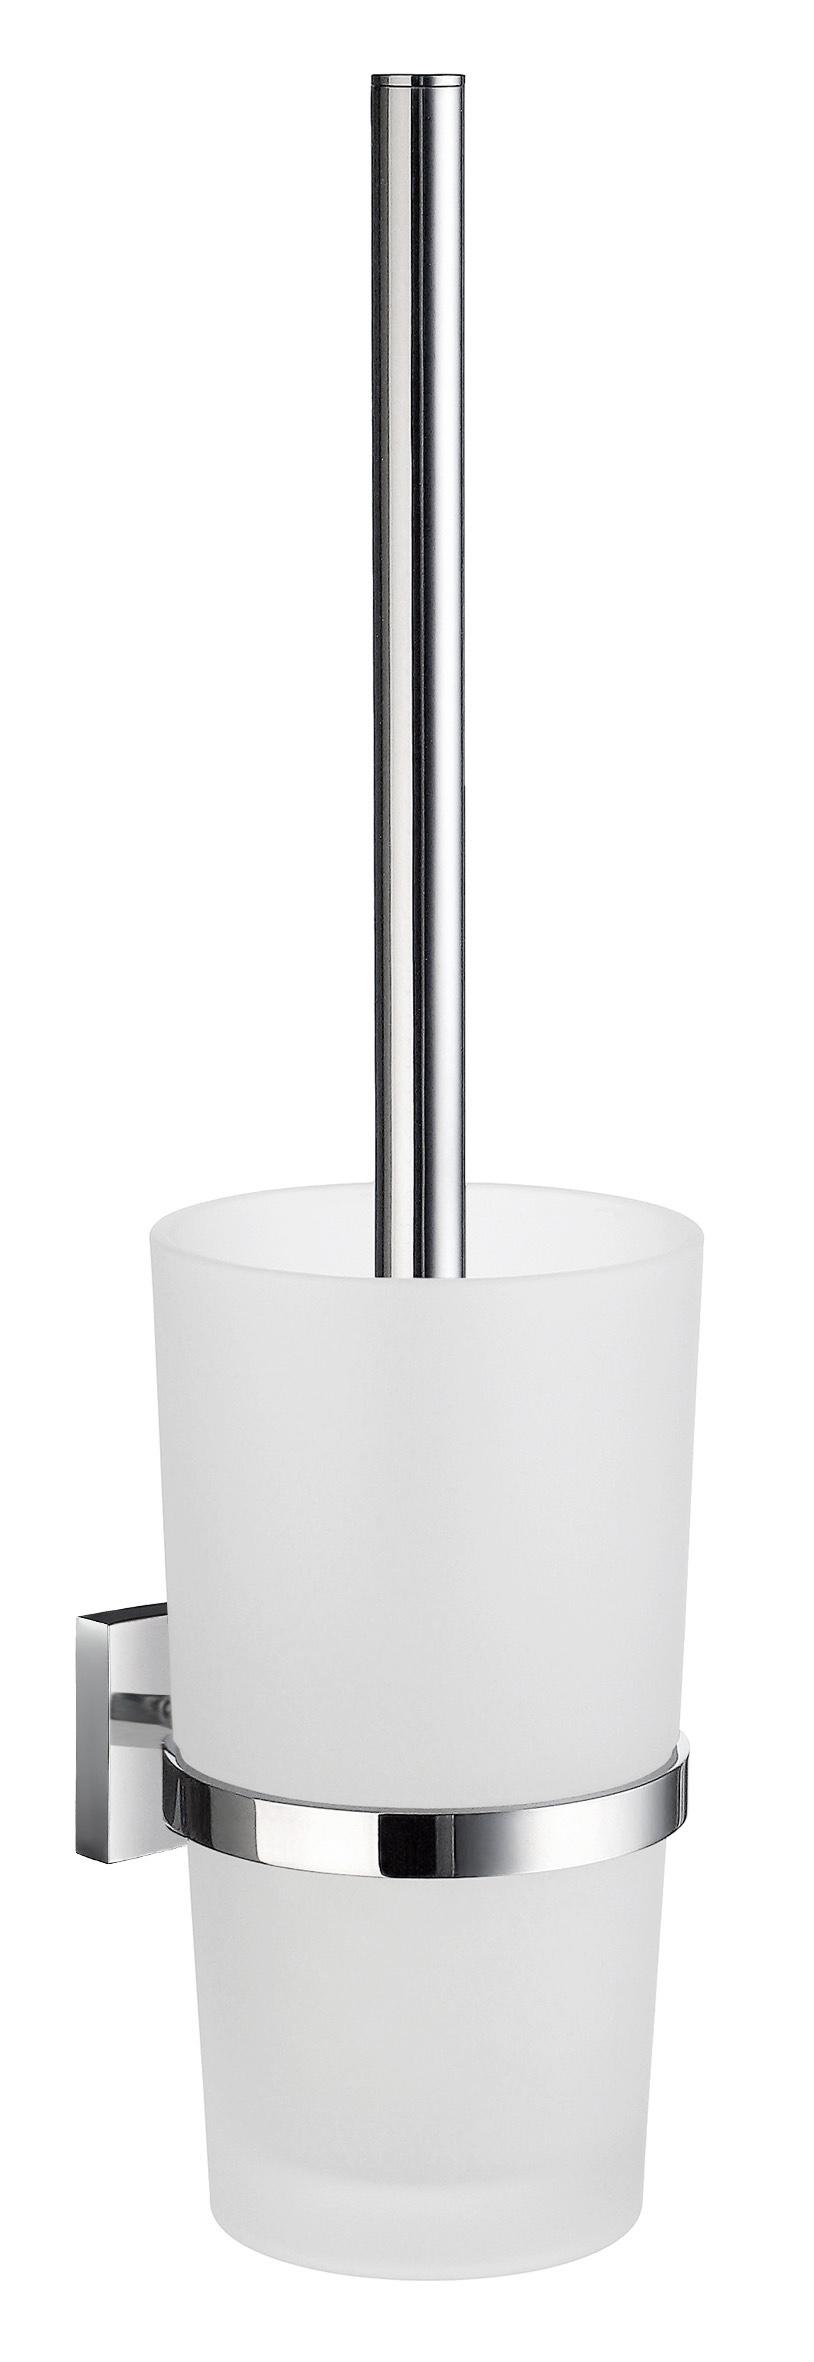 SMEDBO House WC-Bürste mit Behälter